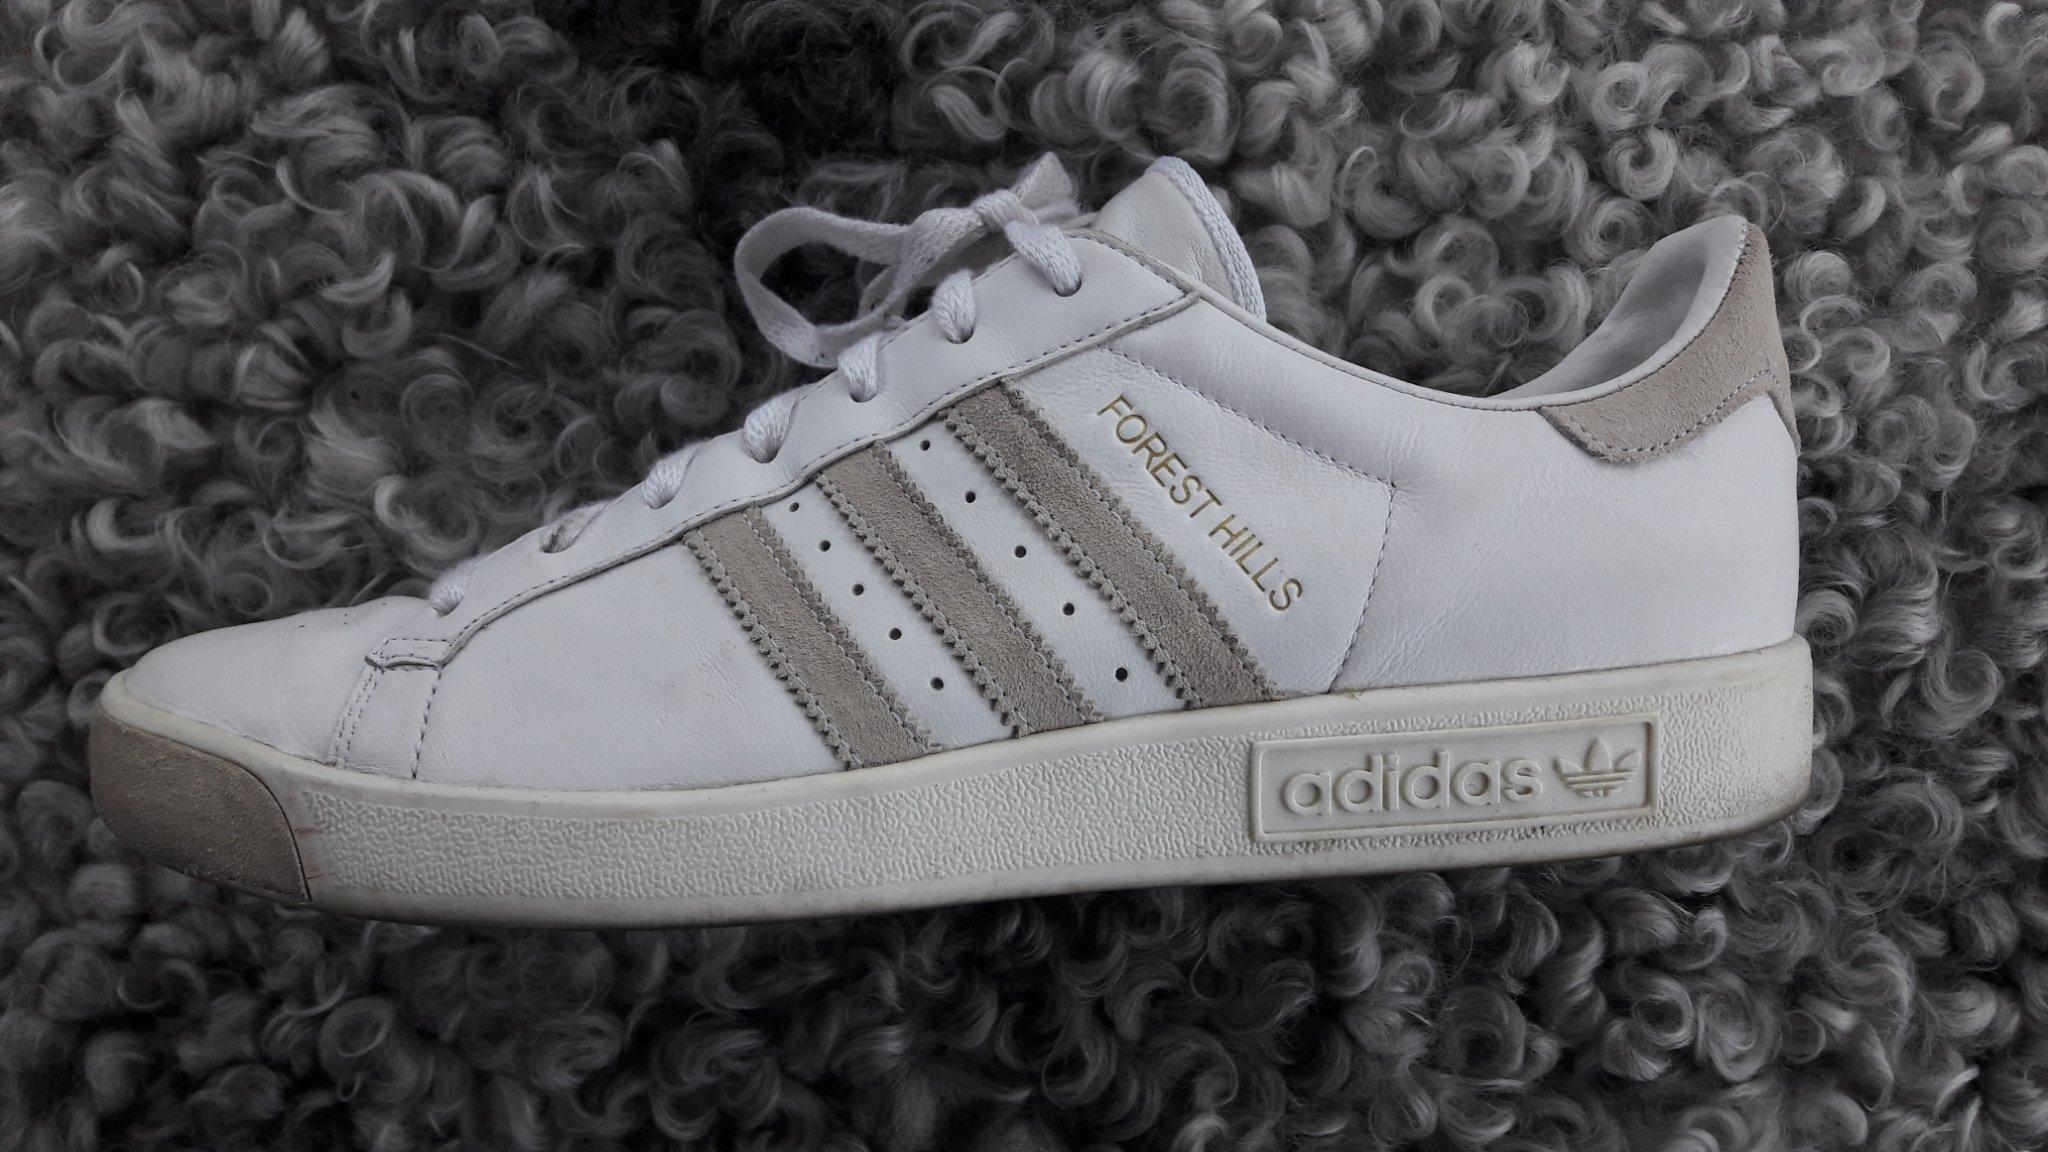 66908680beb Snygga vita Adidas Forest Hills retro tennis skor skinn sneakers sportskor  45-46 ...